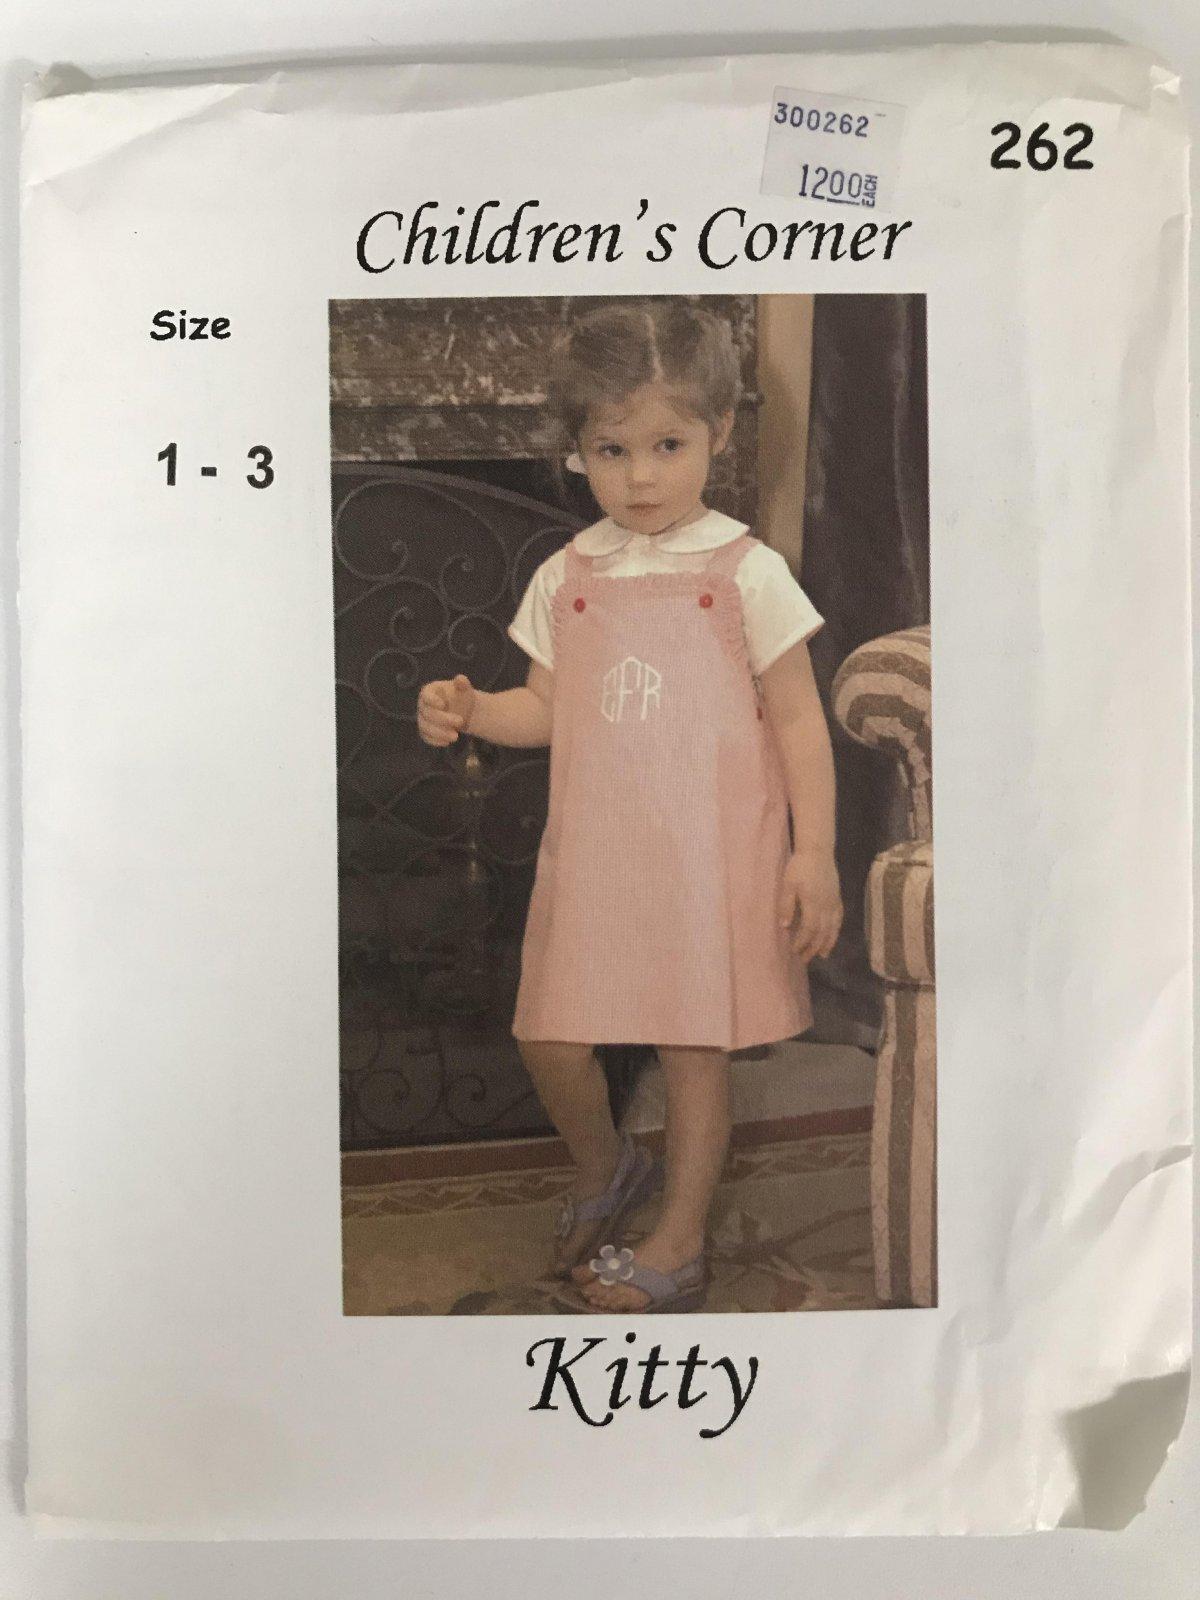 CHILDREN'S CORNER KITTY